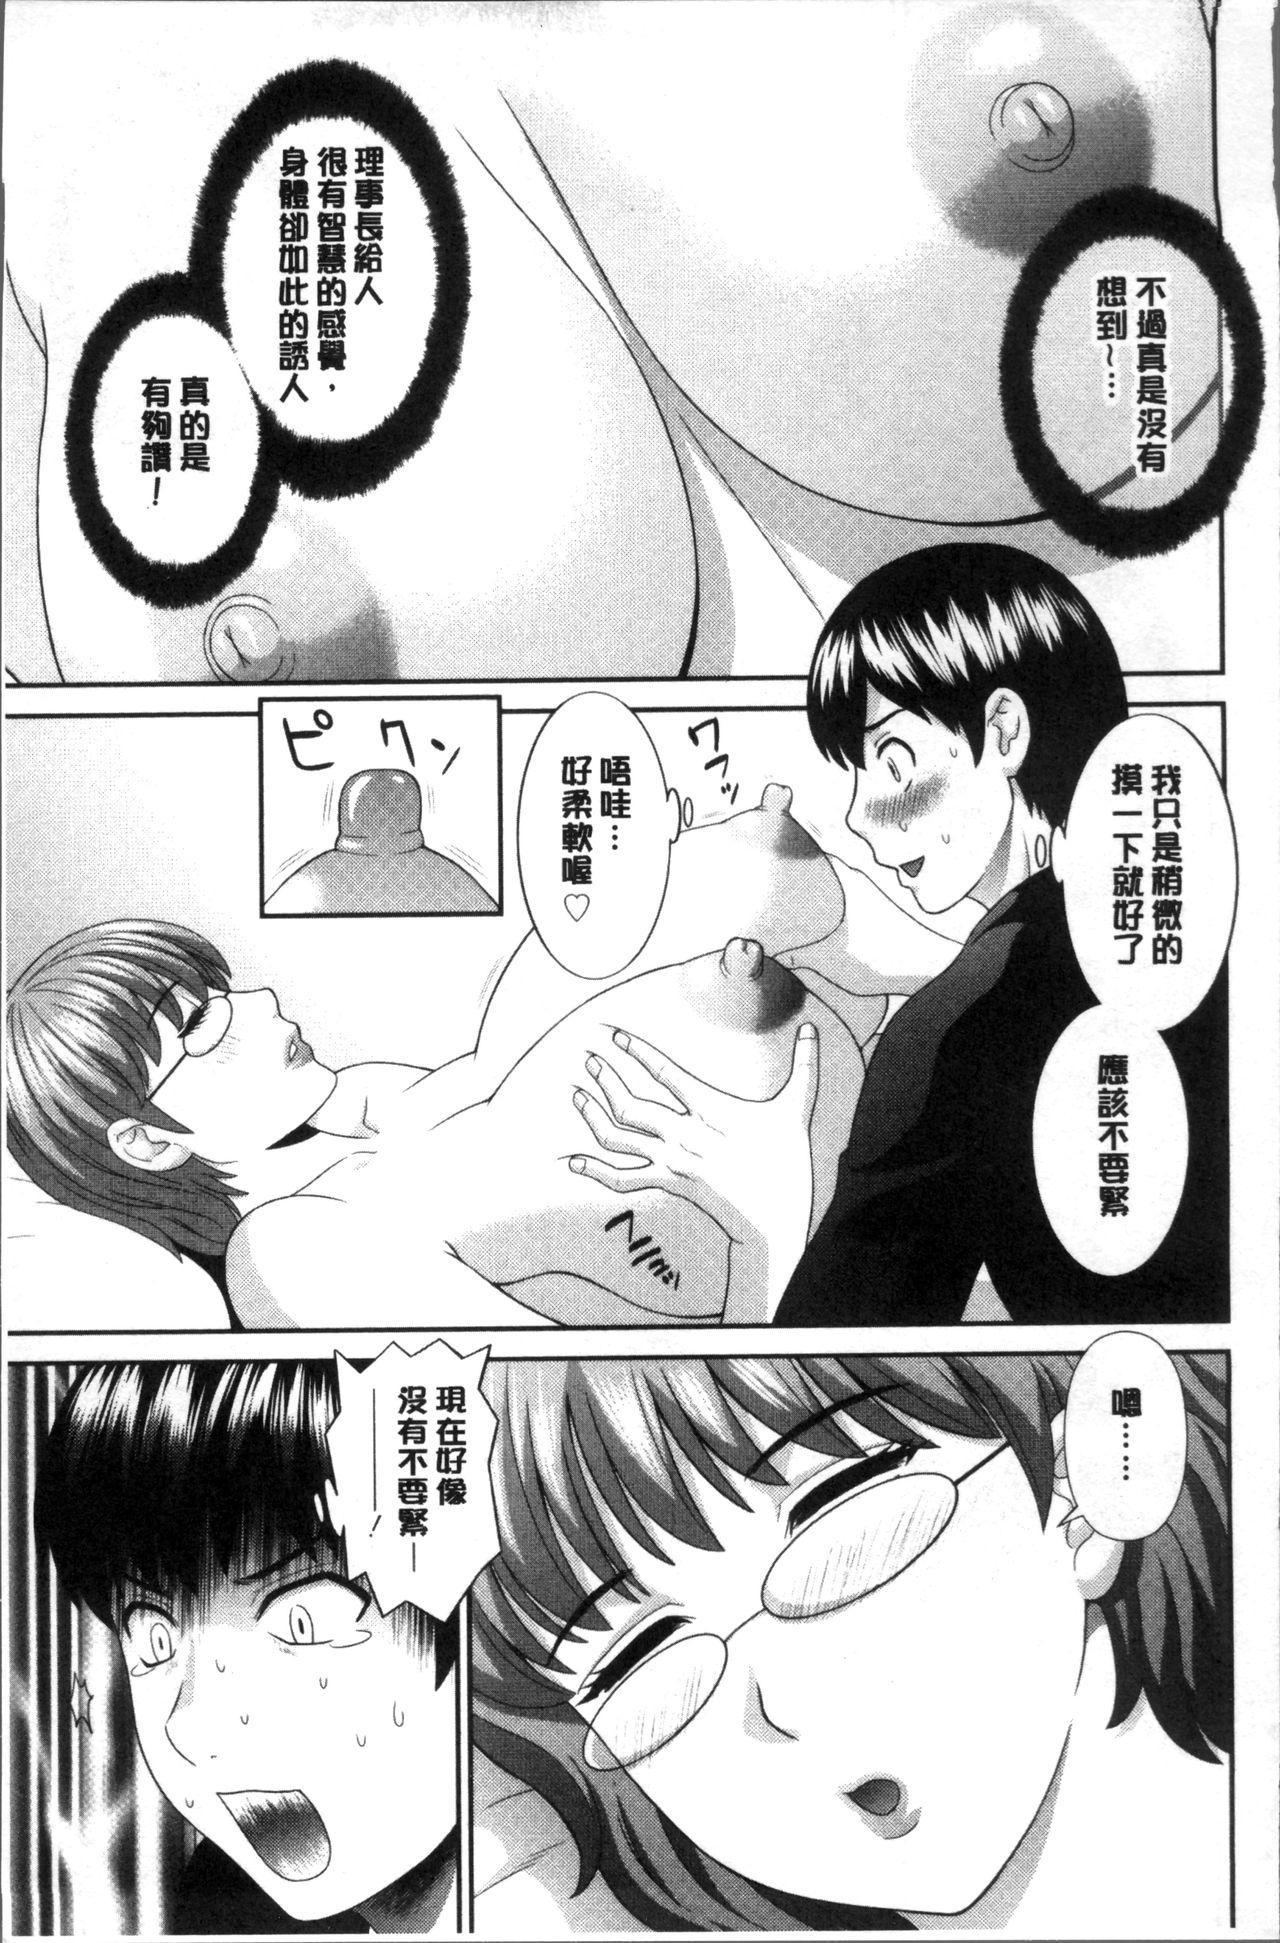 [Kawamori Misaki] Innyuu Shufu no Futei Ganbou - Oku-san to Kanojo to 2 | 淫乳主婦的不貞願望 和人妻也和女友❤2 [Chinese] 32